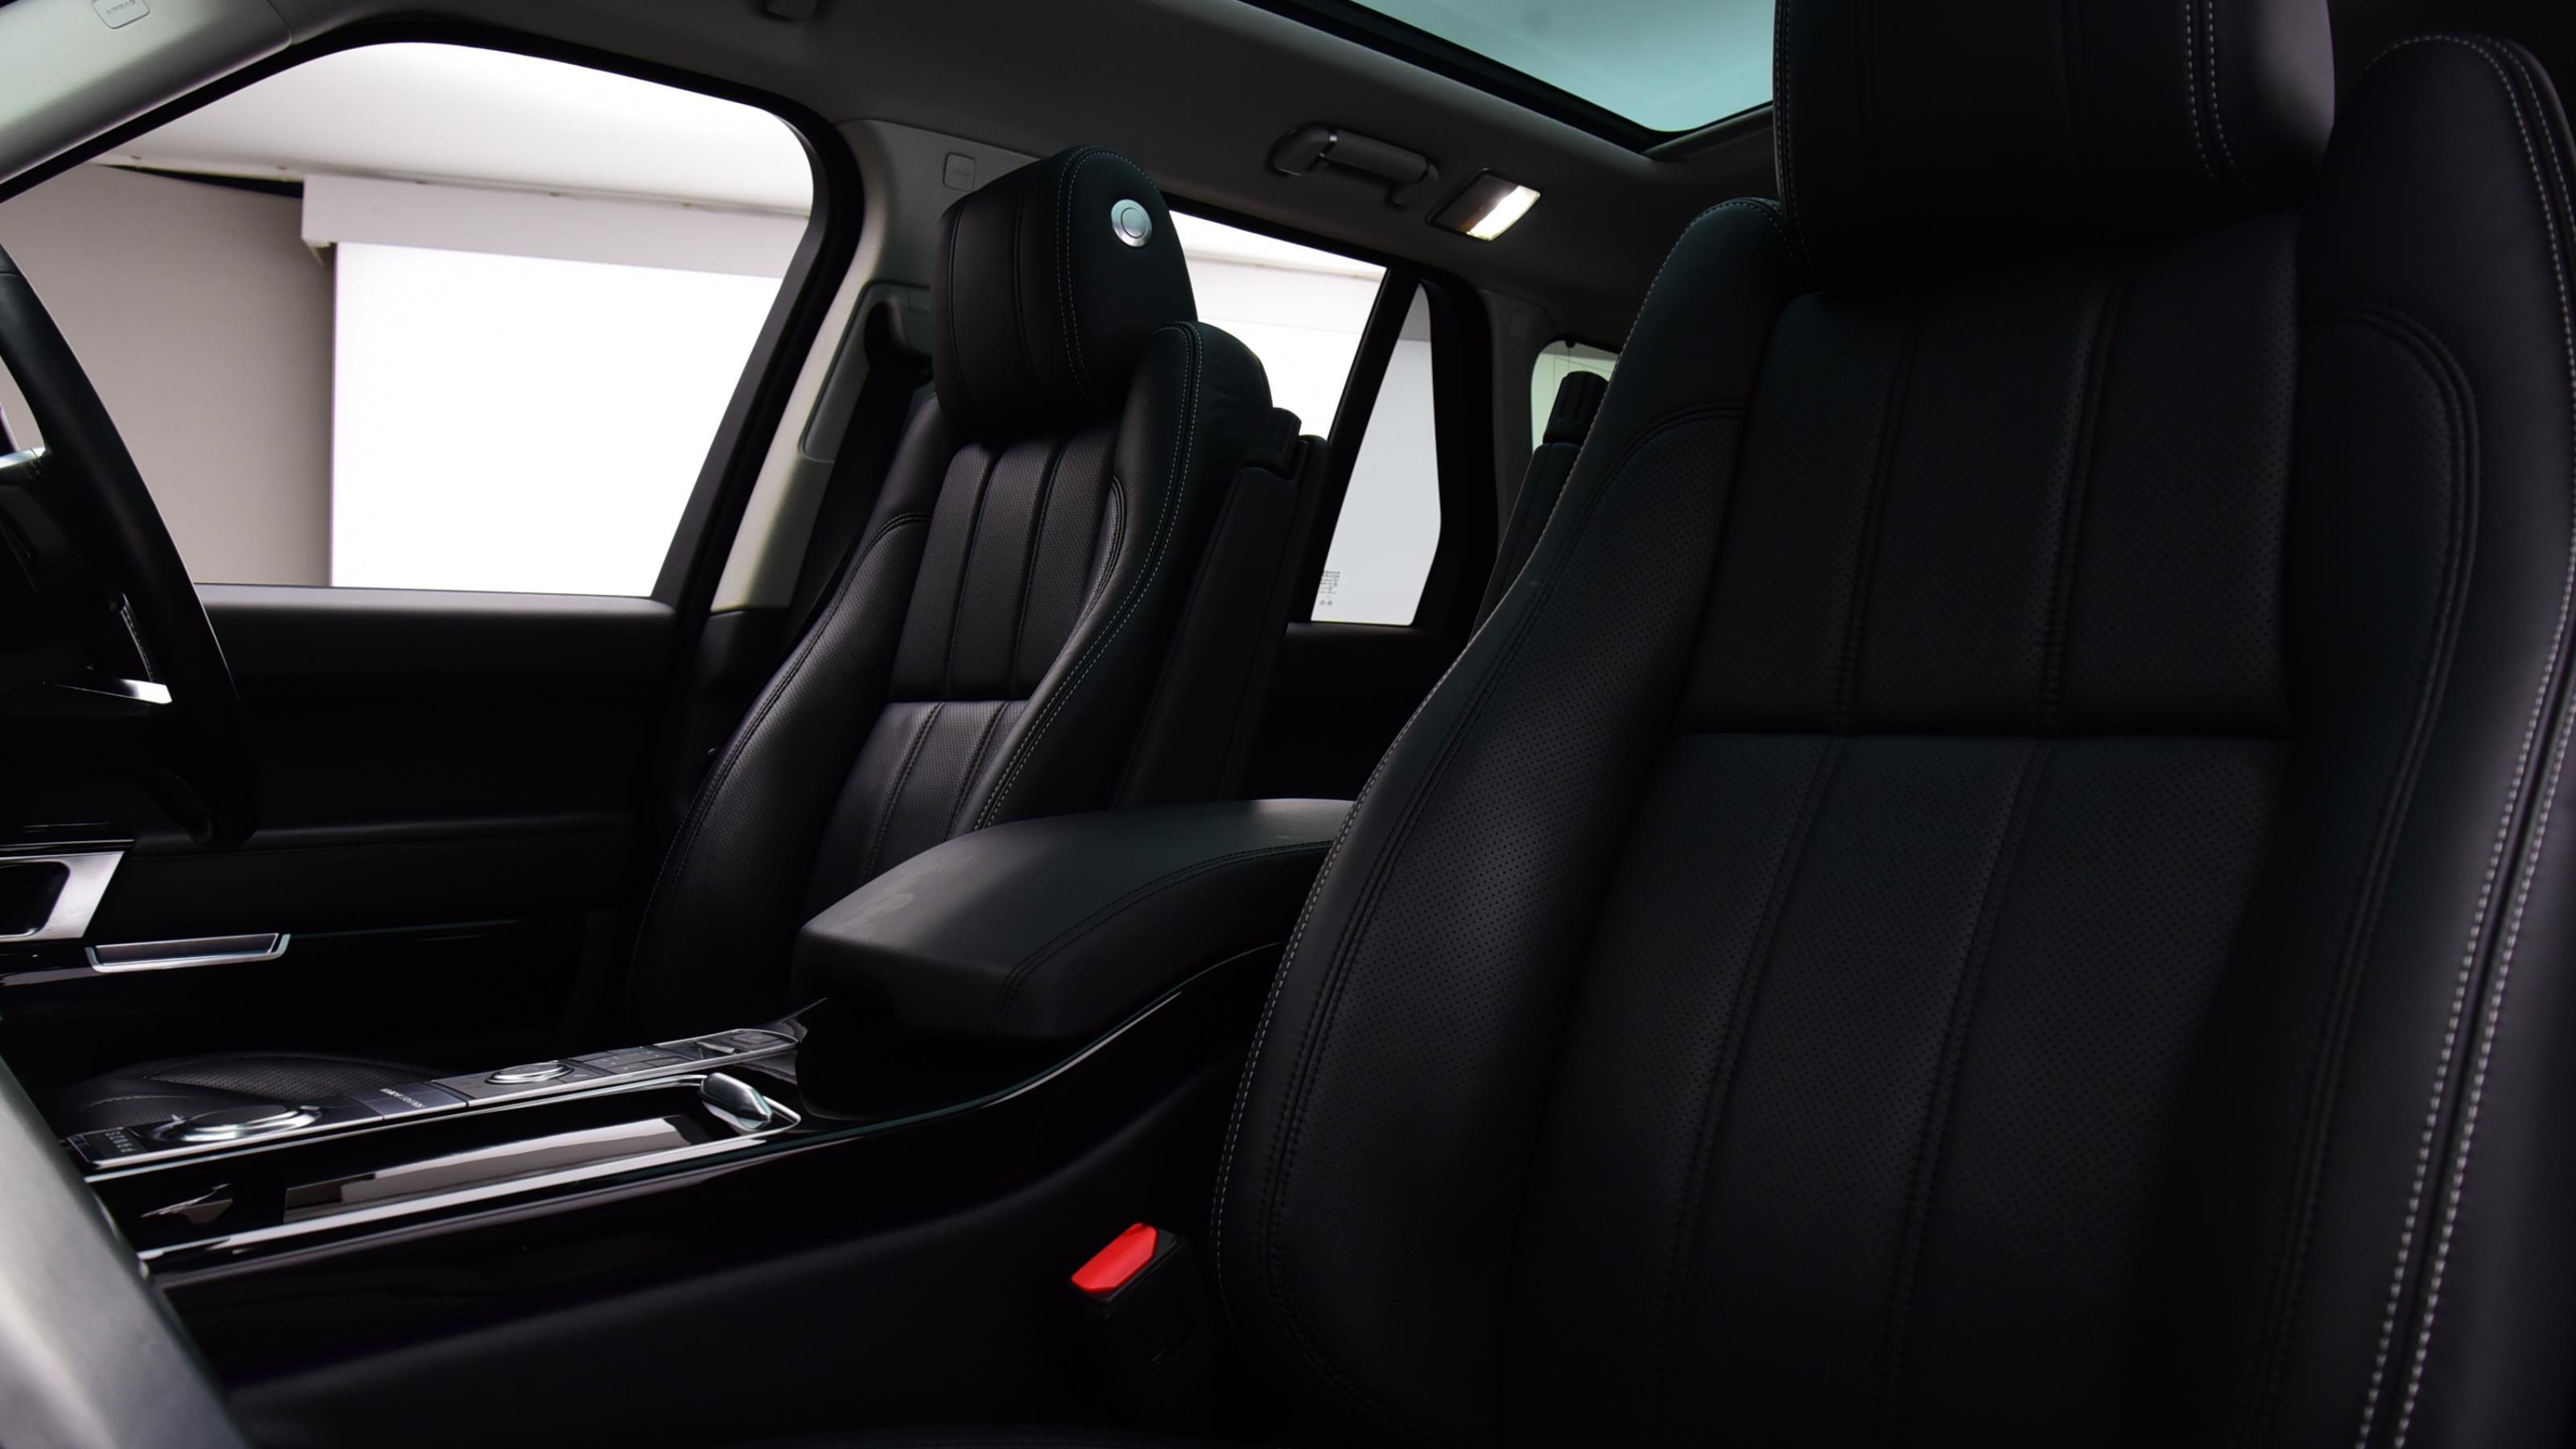 Used 2016 Land Rover RANGE ROVER 3.0 TDV6 Vogue SE 4dr Auto WHITE at Saxton4x4